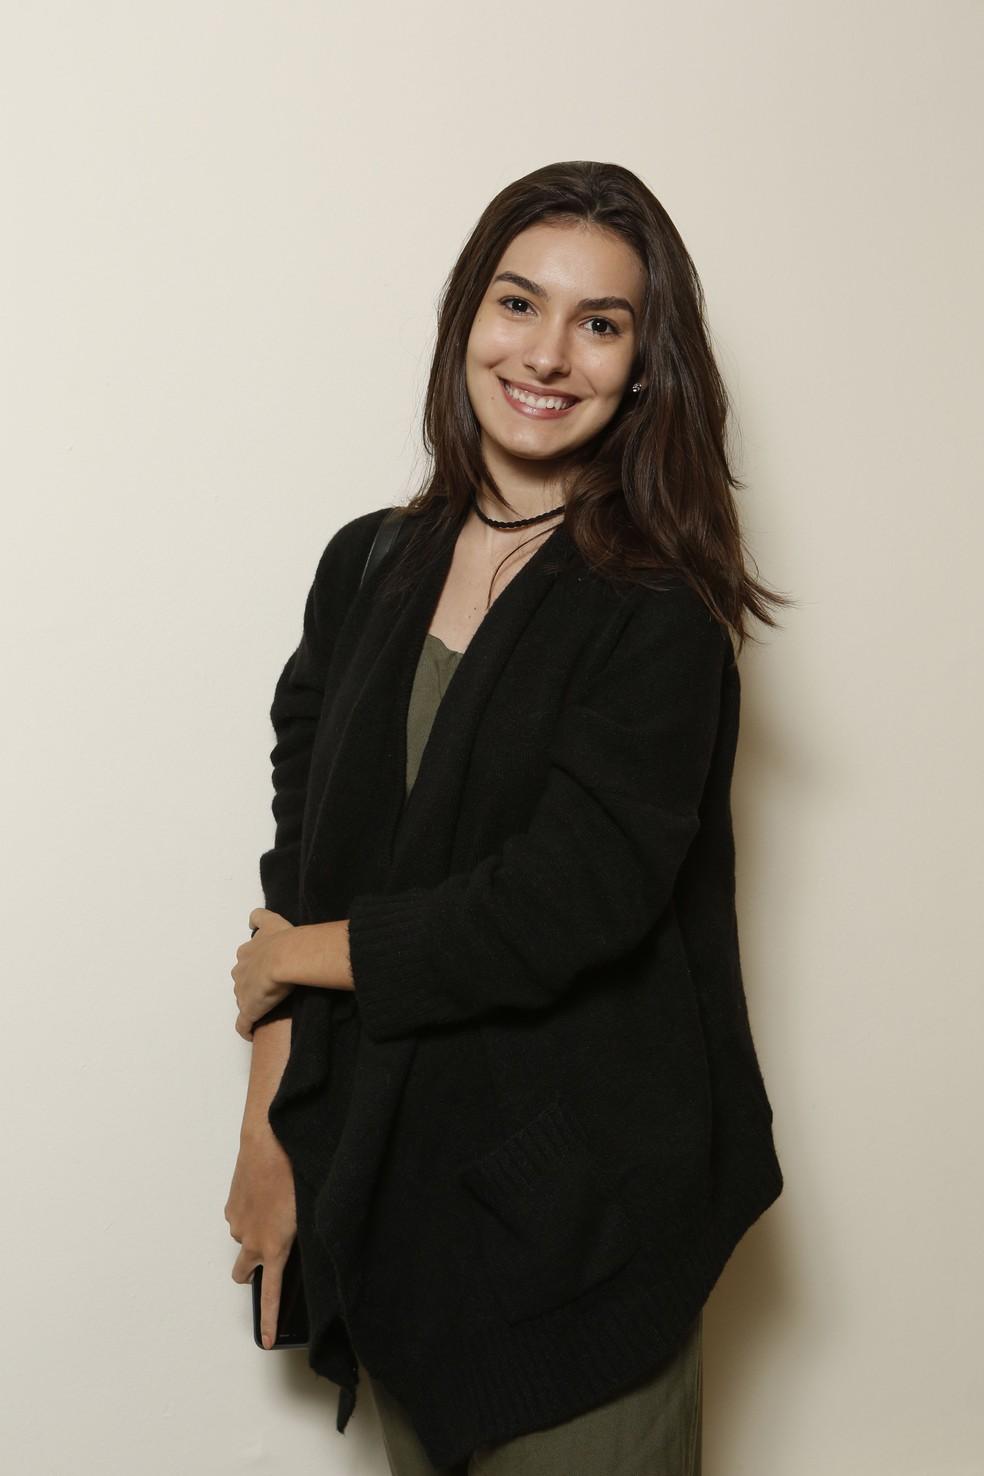 Marina Moschen brilhou como a estilista Yasmin na reta final da novela (Foto: Felipe Monteiro / Gshow)